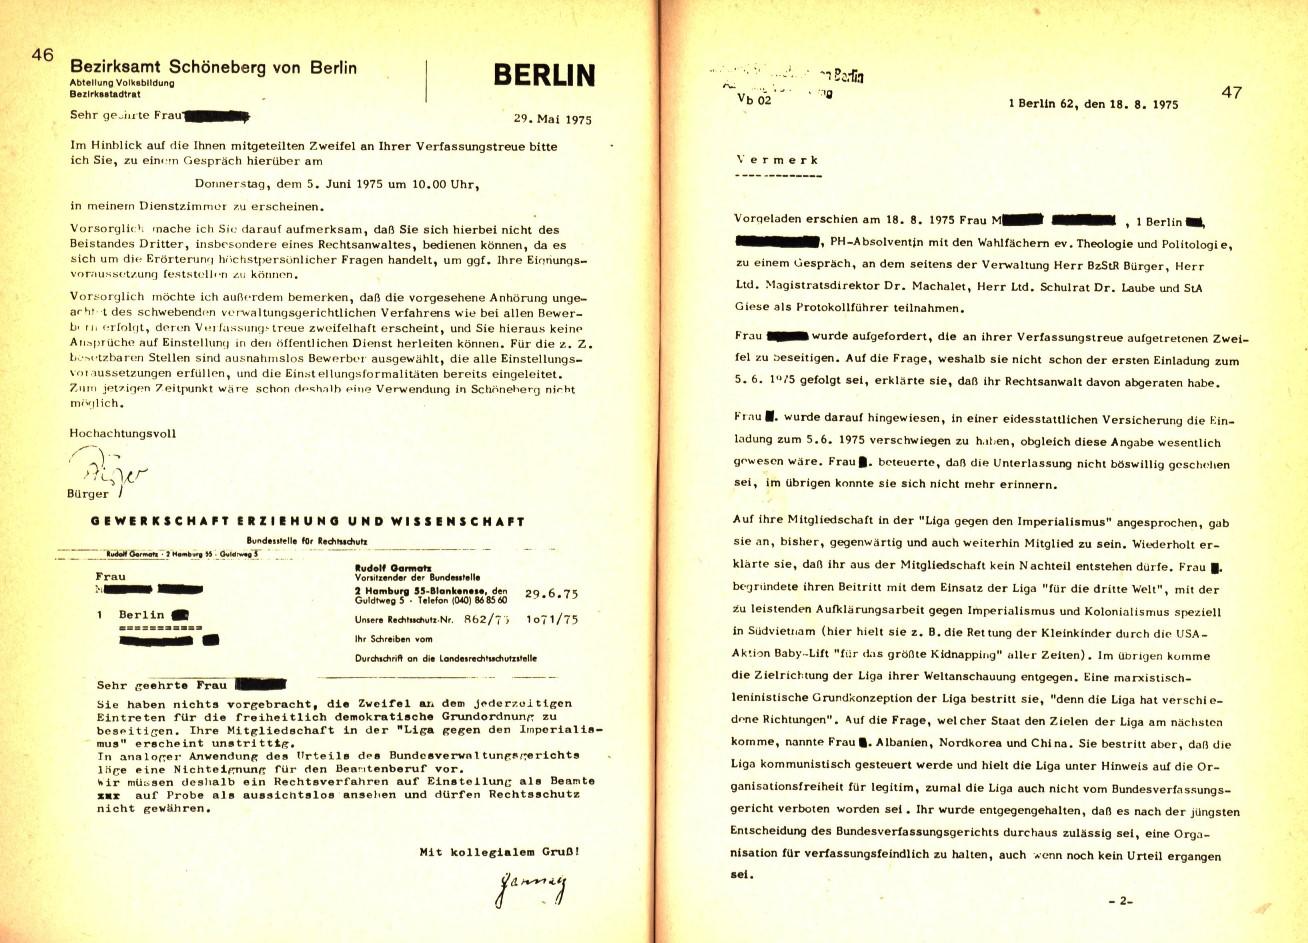 Berlin_VDS_Aktionskomitee_1975_BerufsverboteII_25